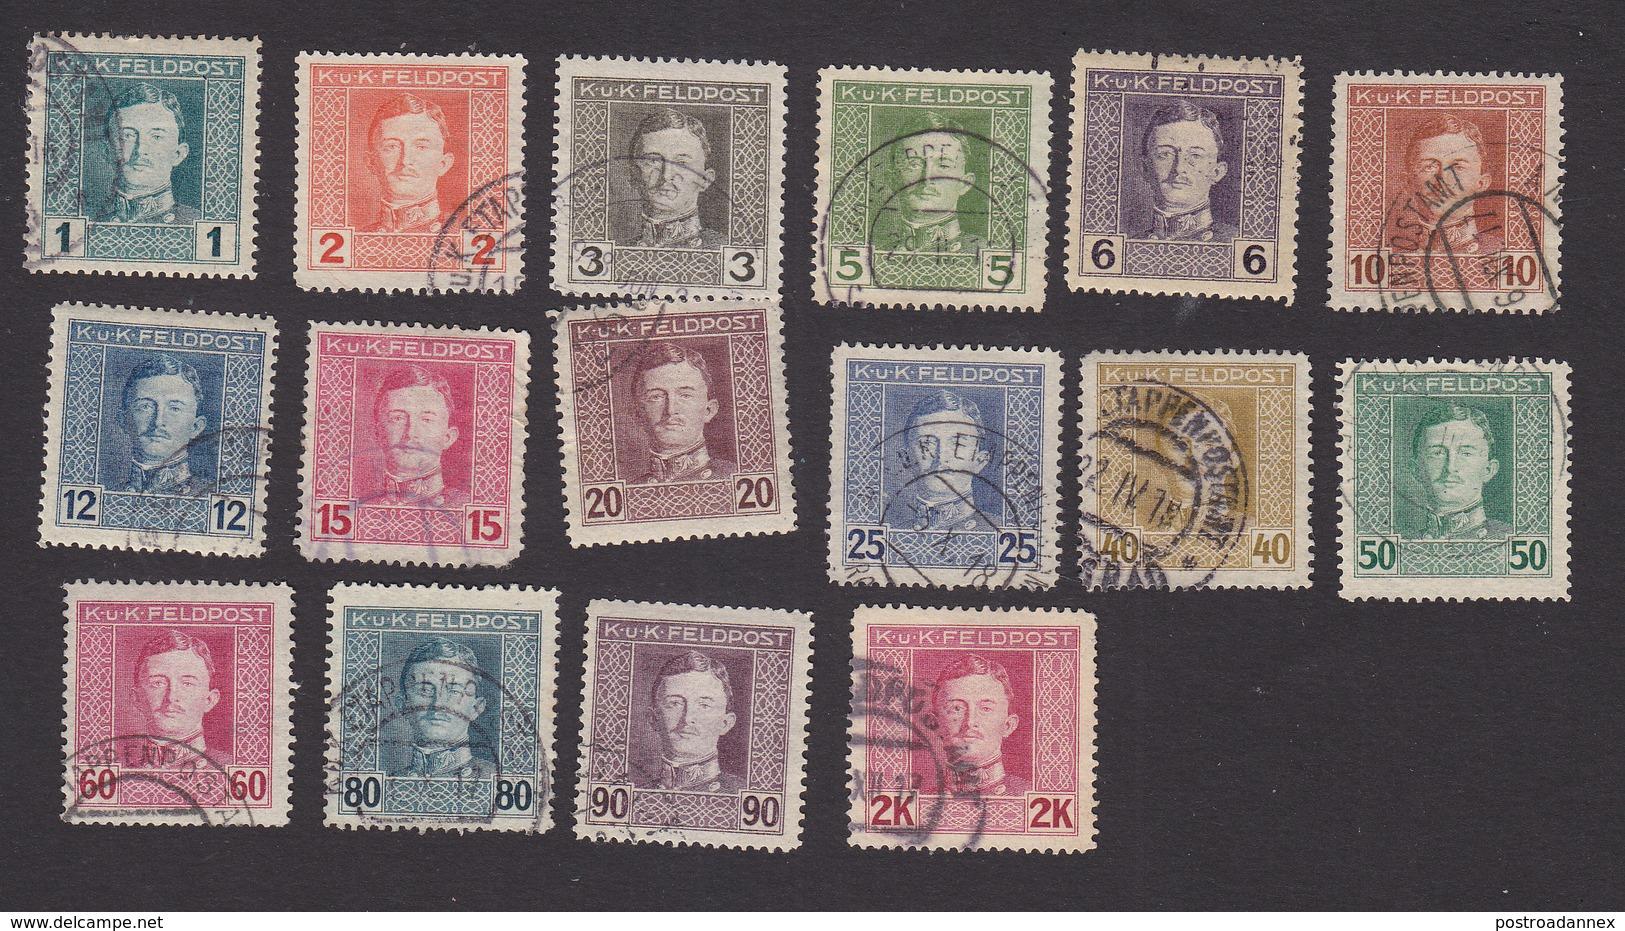 Austria, Scott #M49-M58, M60-M65, Used, Emperor Karl I Military Stamps, Issued 1917 - Austria